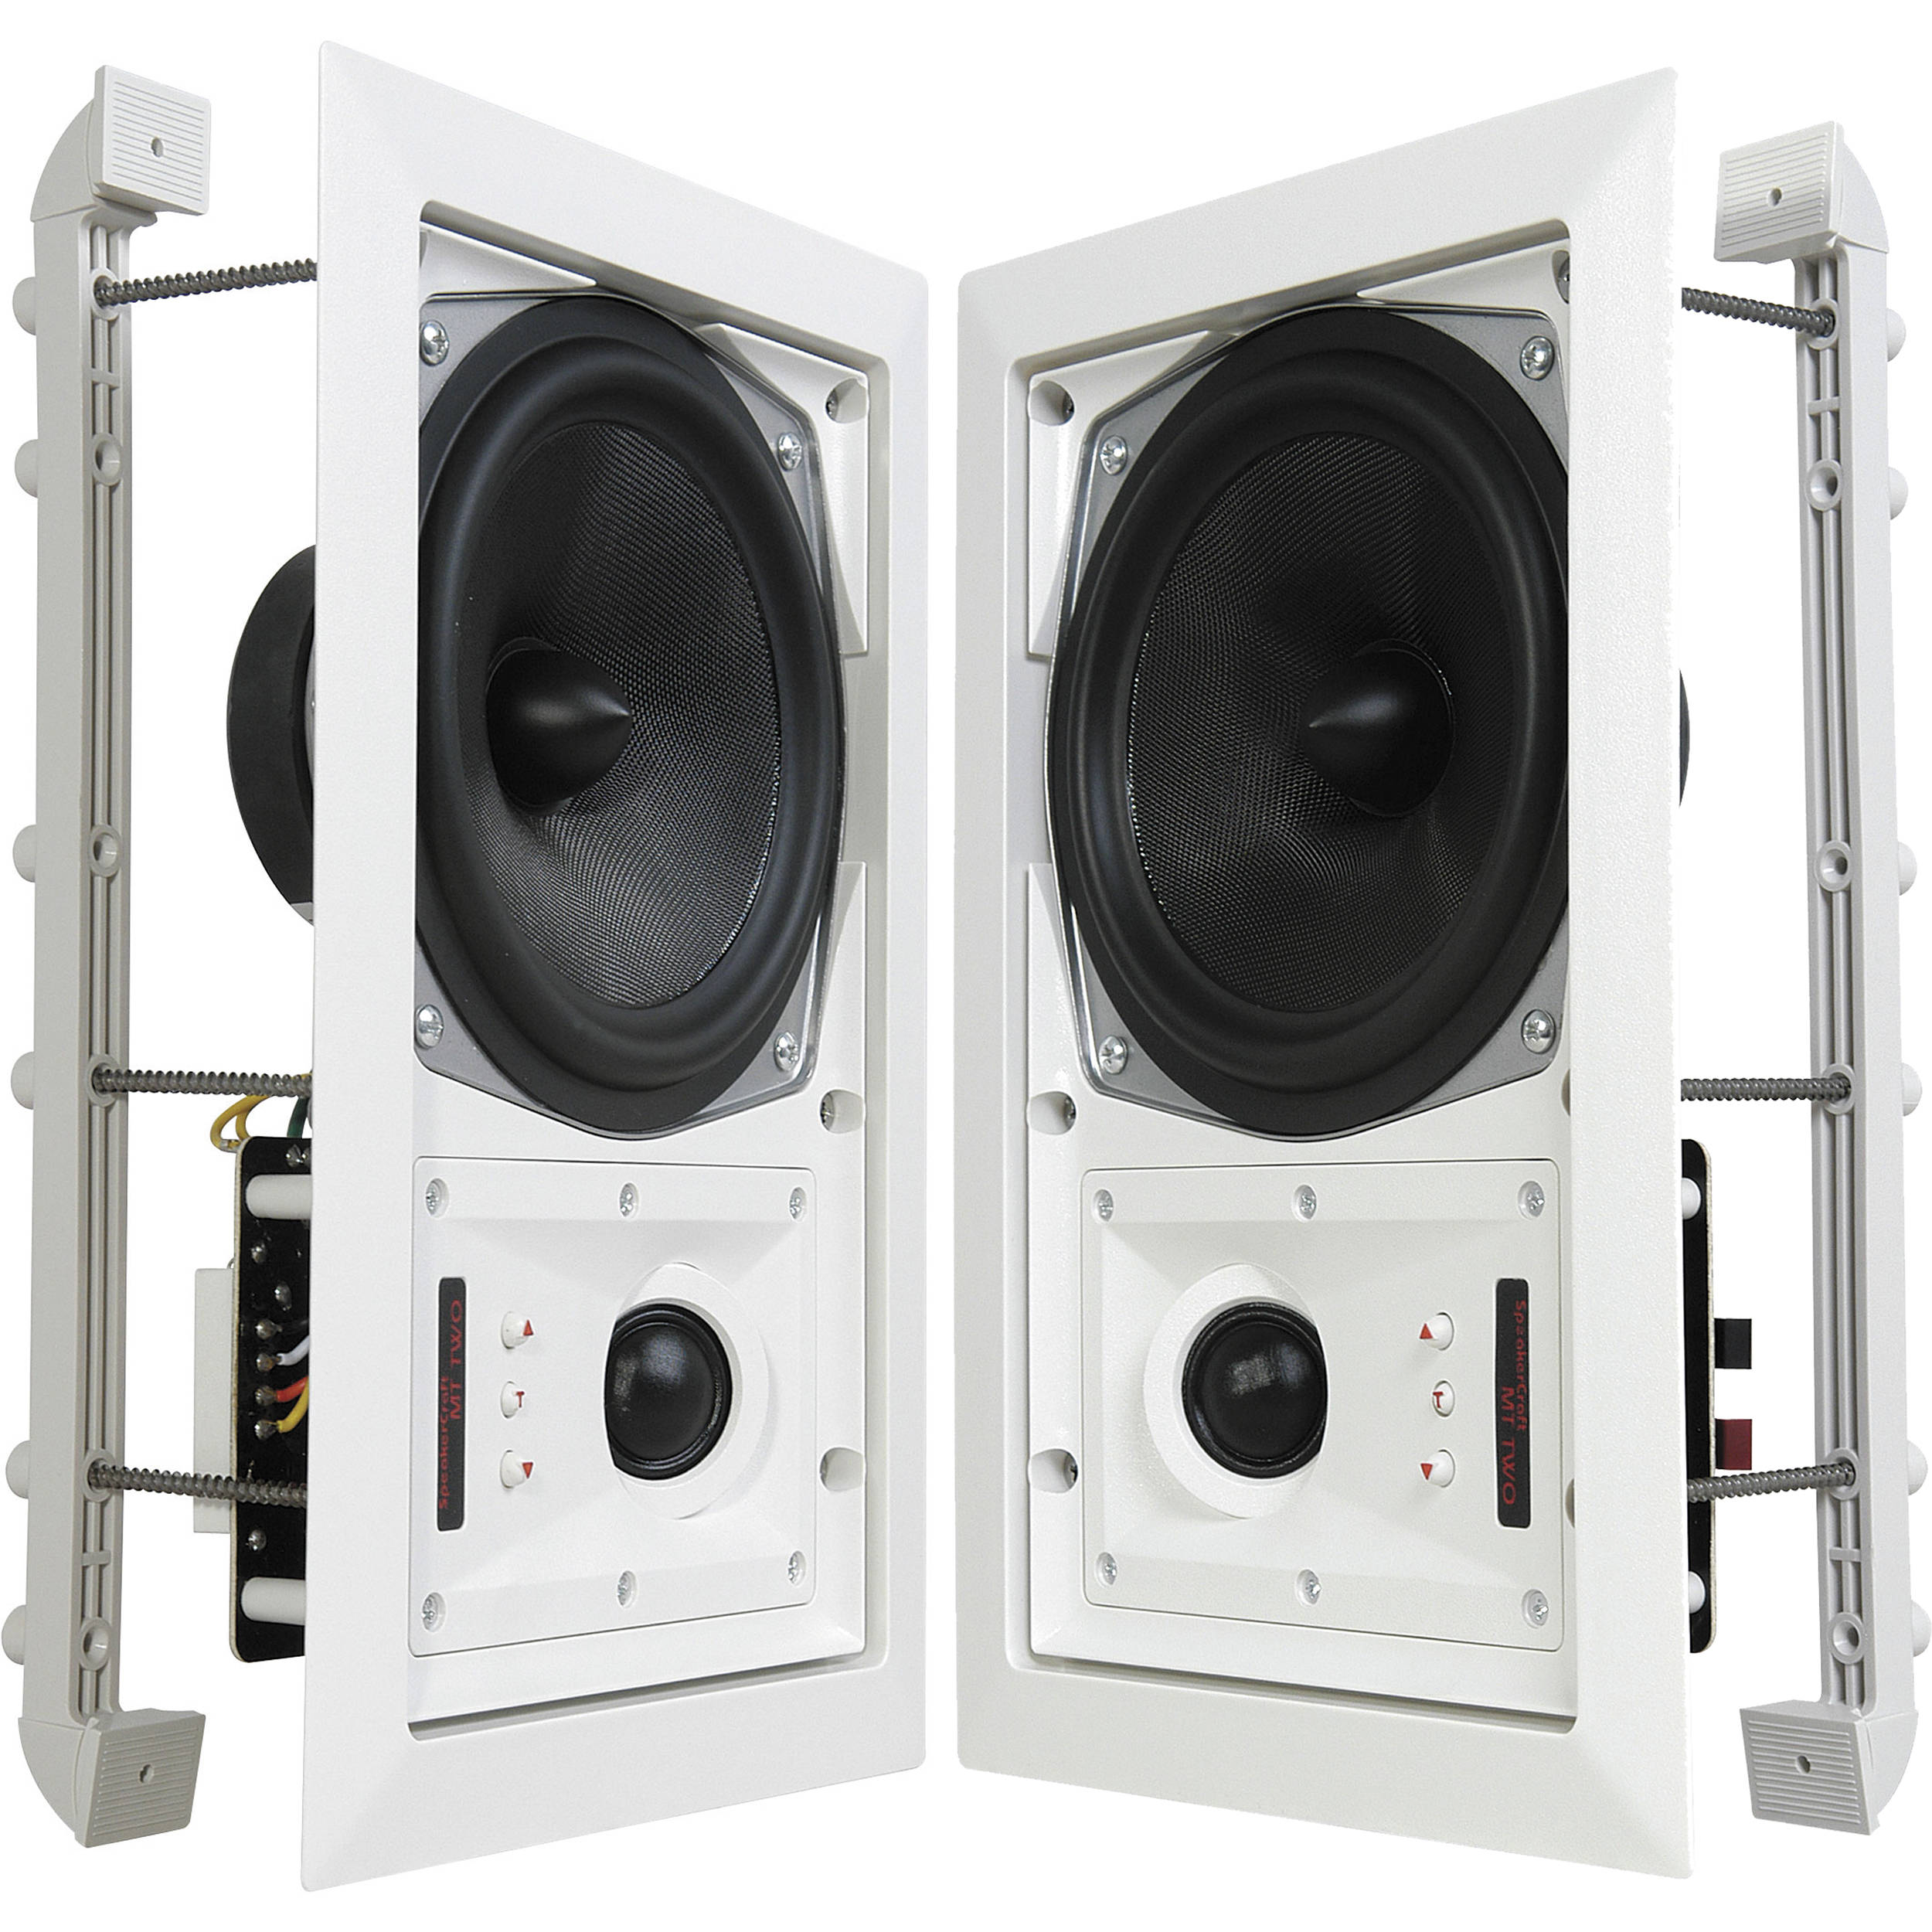 SpeakerCraft_ASM87620_MT6_Two_In_Wall_Speaker_851247